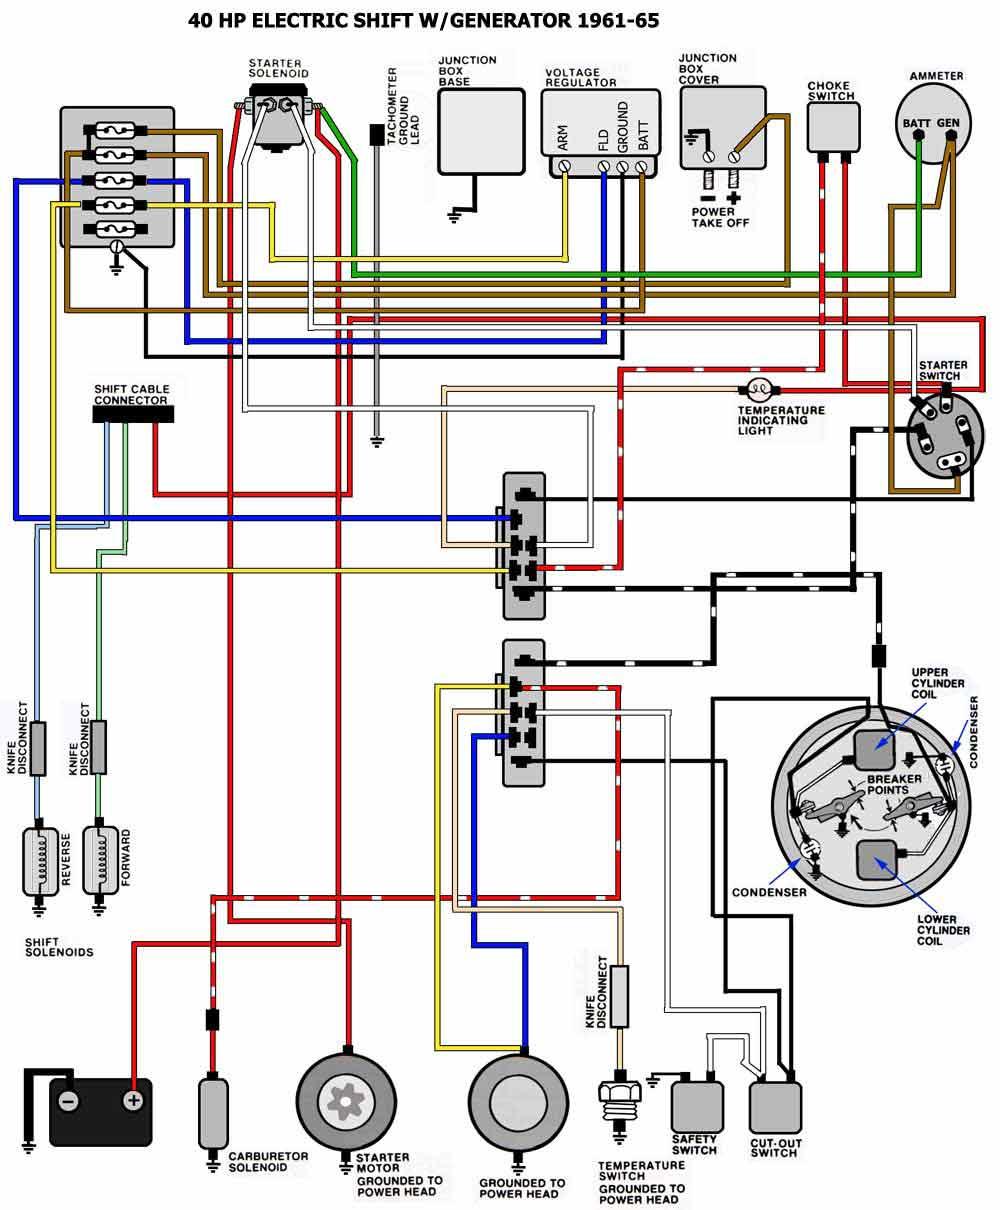 Awe Inspiring Evinrude Outboard Motors Wiring Diagrams Diagram Data Schema Wiring Cloud Timewinrebemohammedshrineorg